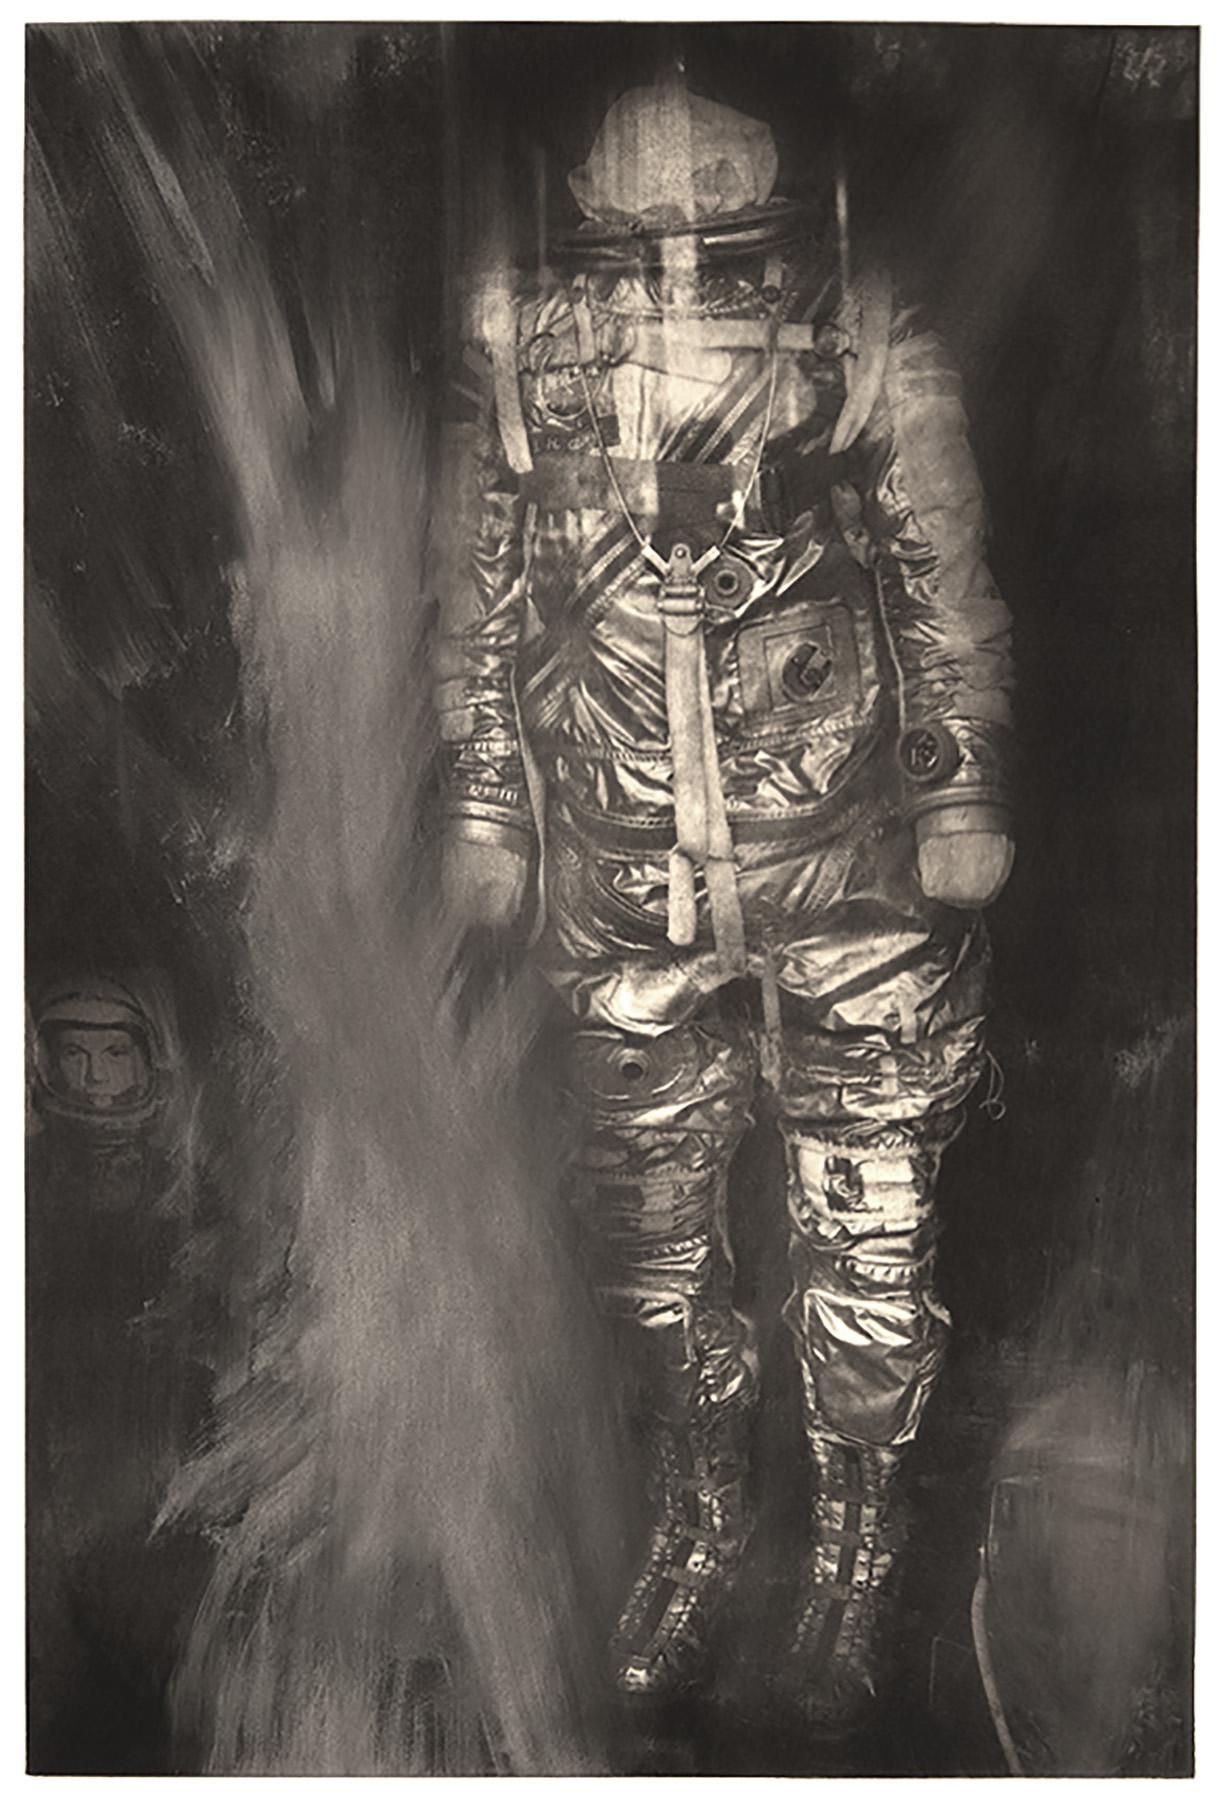 John Glenn's Space Suit II